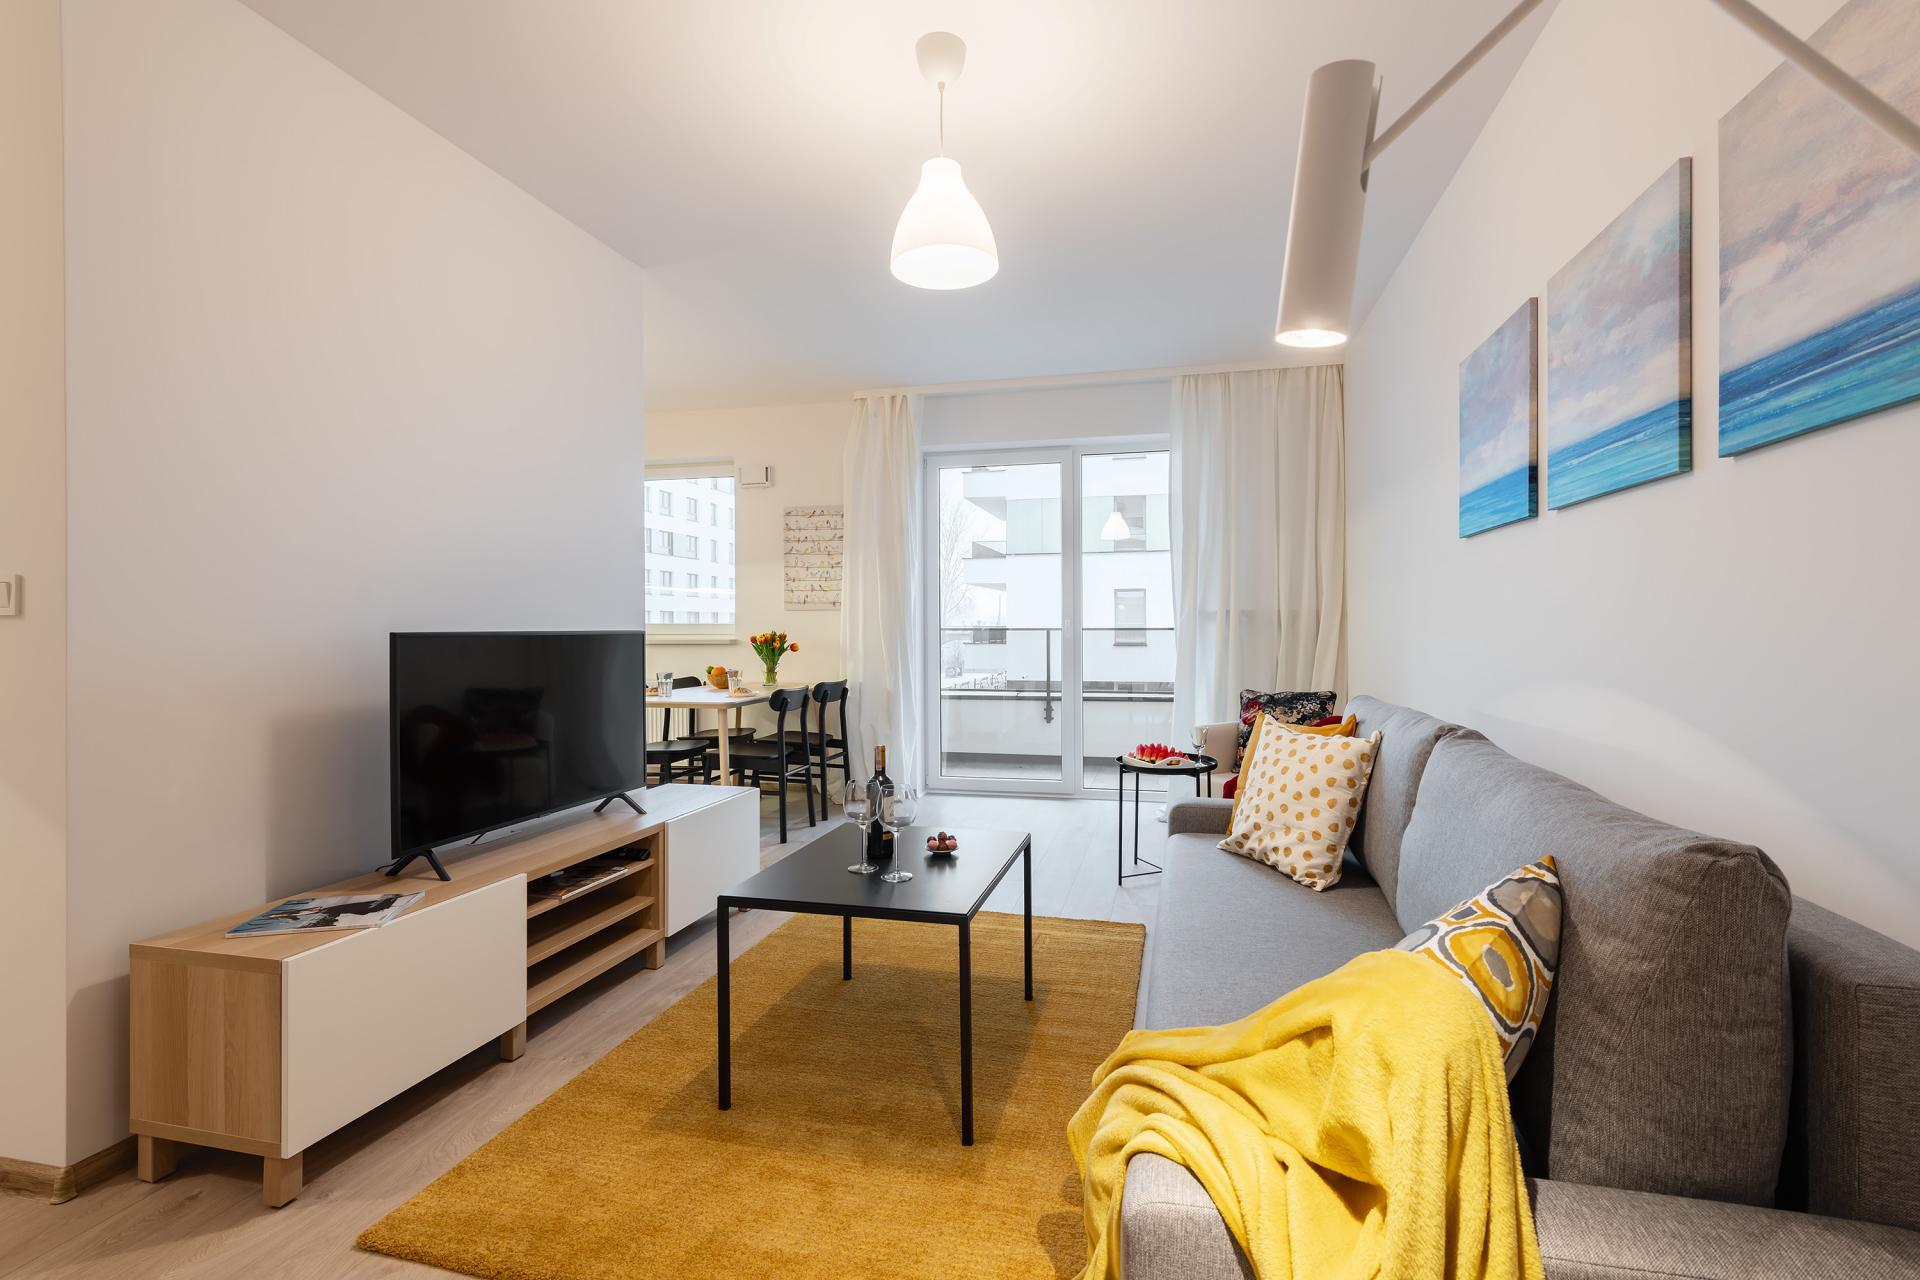 Living area at Cybernetyki Apartments, Sluzewiec, Warsaw